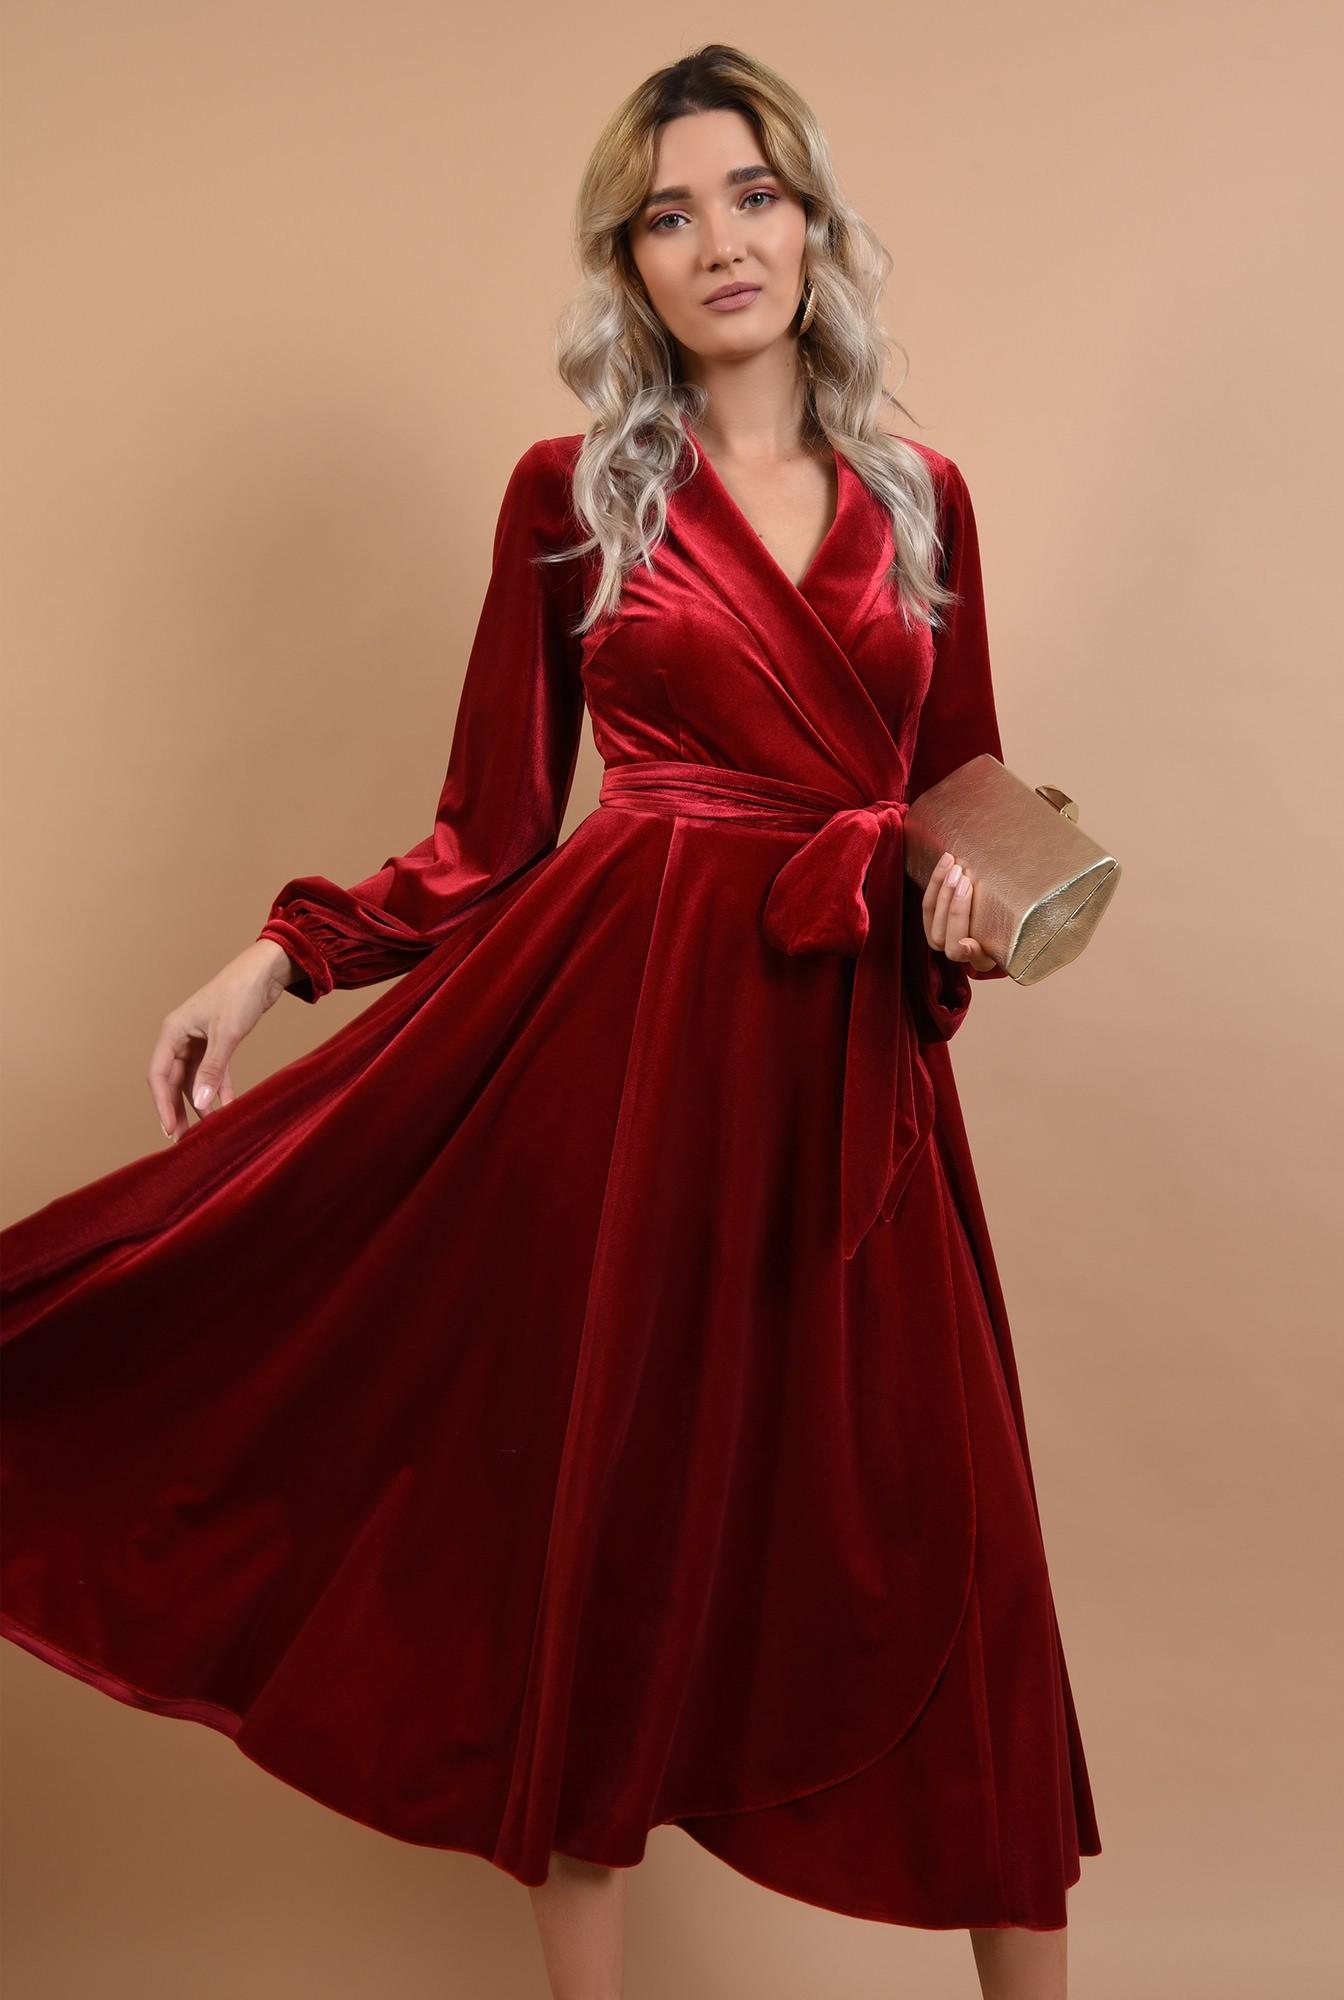 0 - 360 - rochie eleganta, midi, evazata, cu cordon, maneci lungi